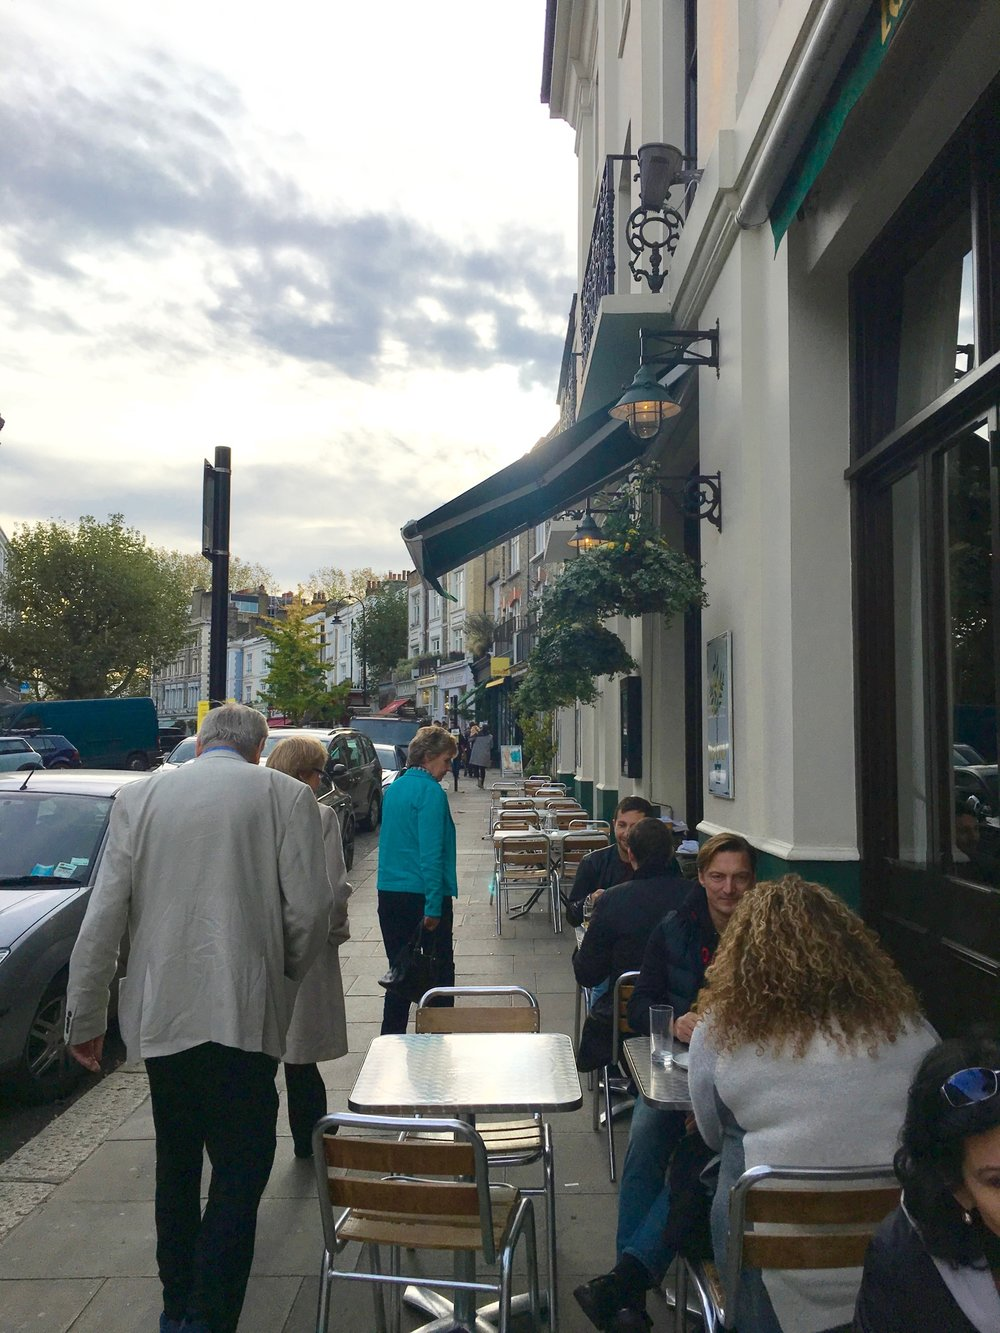 primrose_hill_london_vegan_travel_vegan_restaurants_in_london_manna.jpg